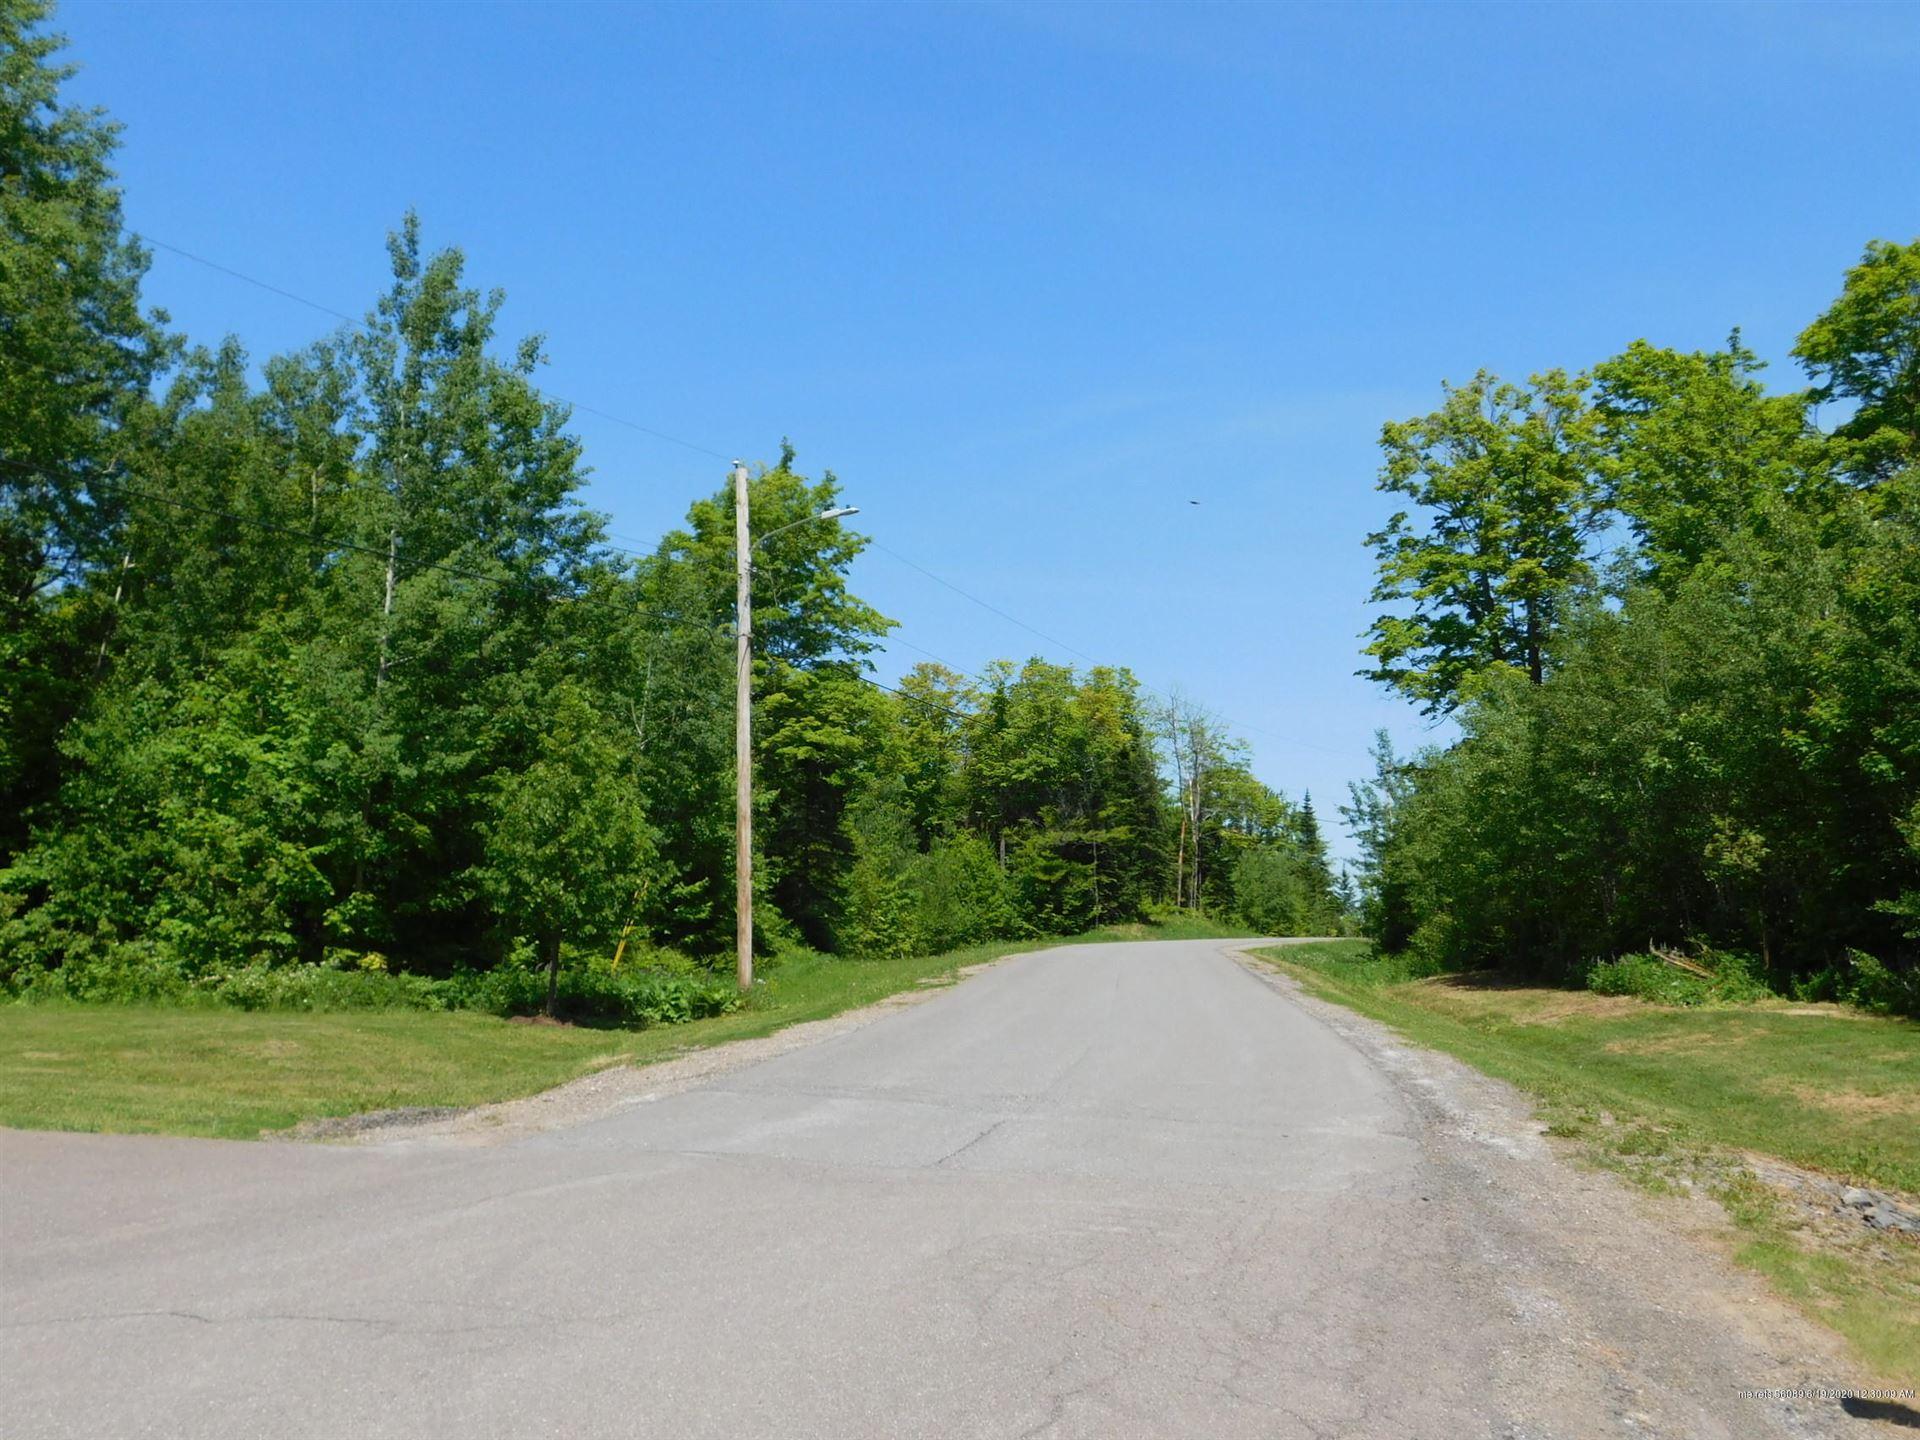 Photo of 1 Duncan Drive, Easton, ME 04740 (MLS # 1439385)